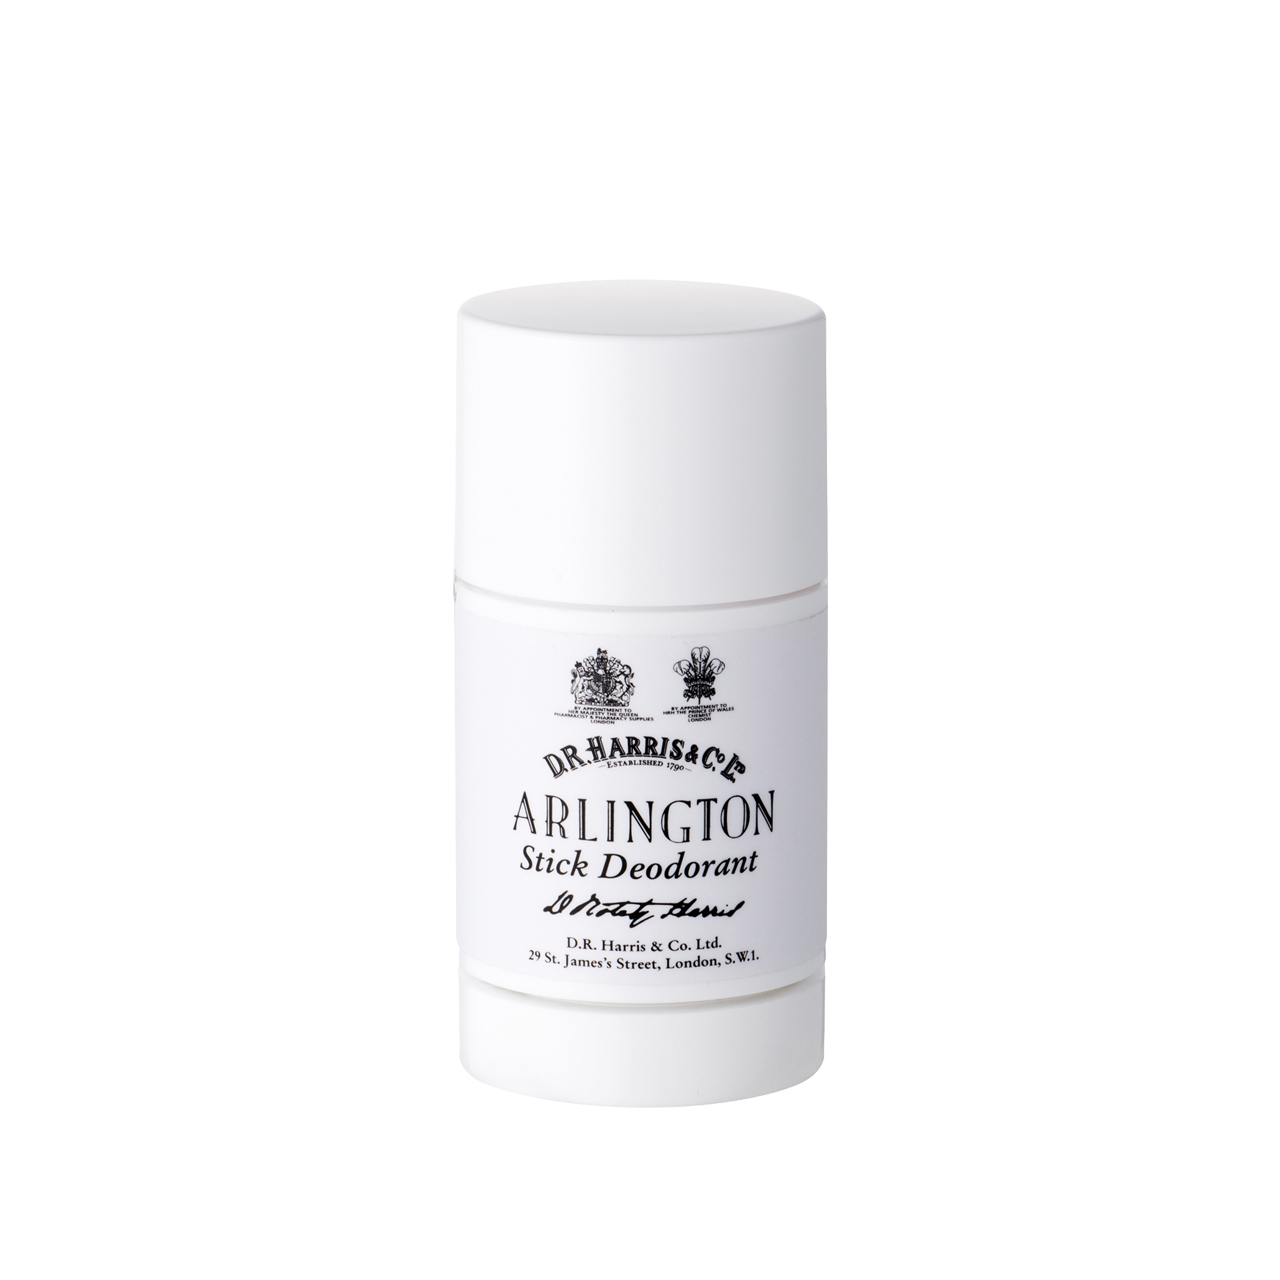 Arlington - Deodorant Stick